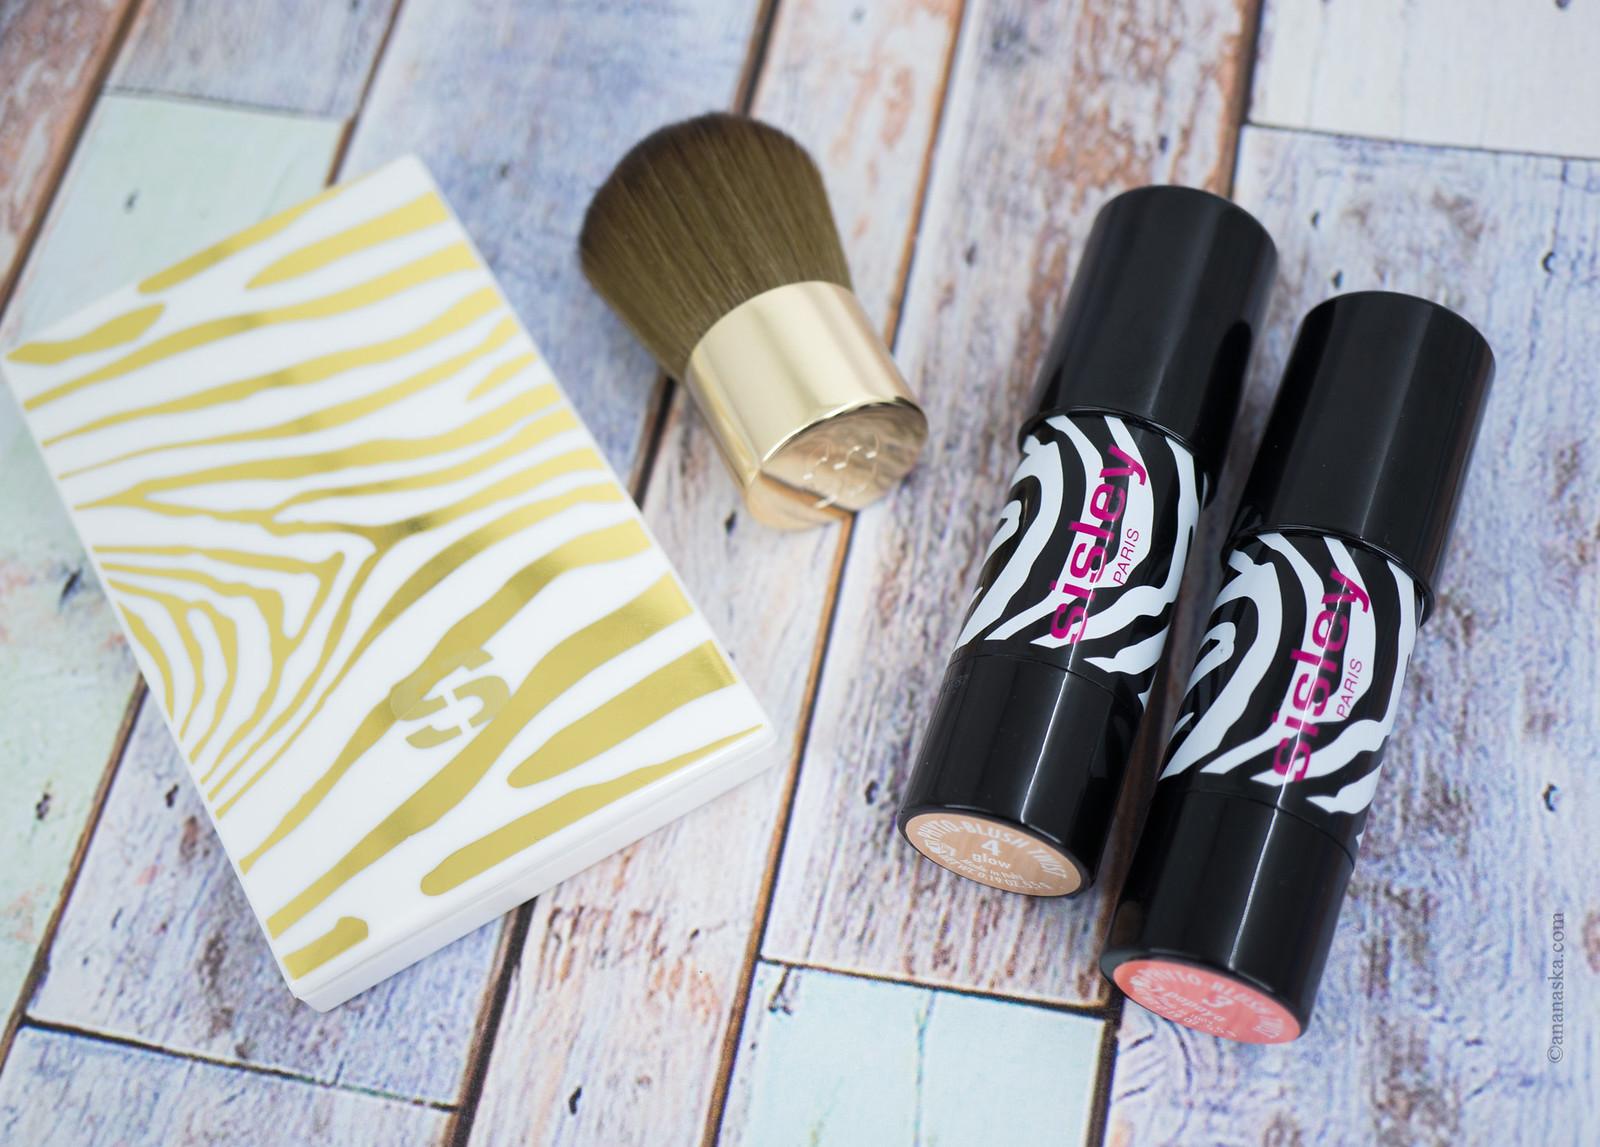 Sisley Phyto-Blush Twist, Sisley Phyto-Touche Sun Glow Powder